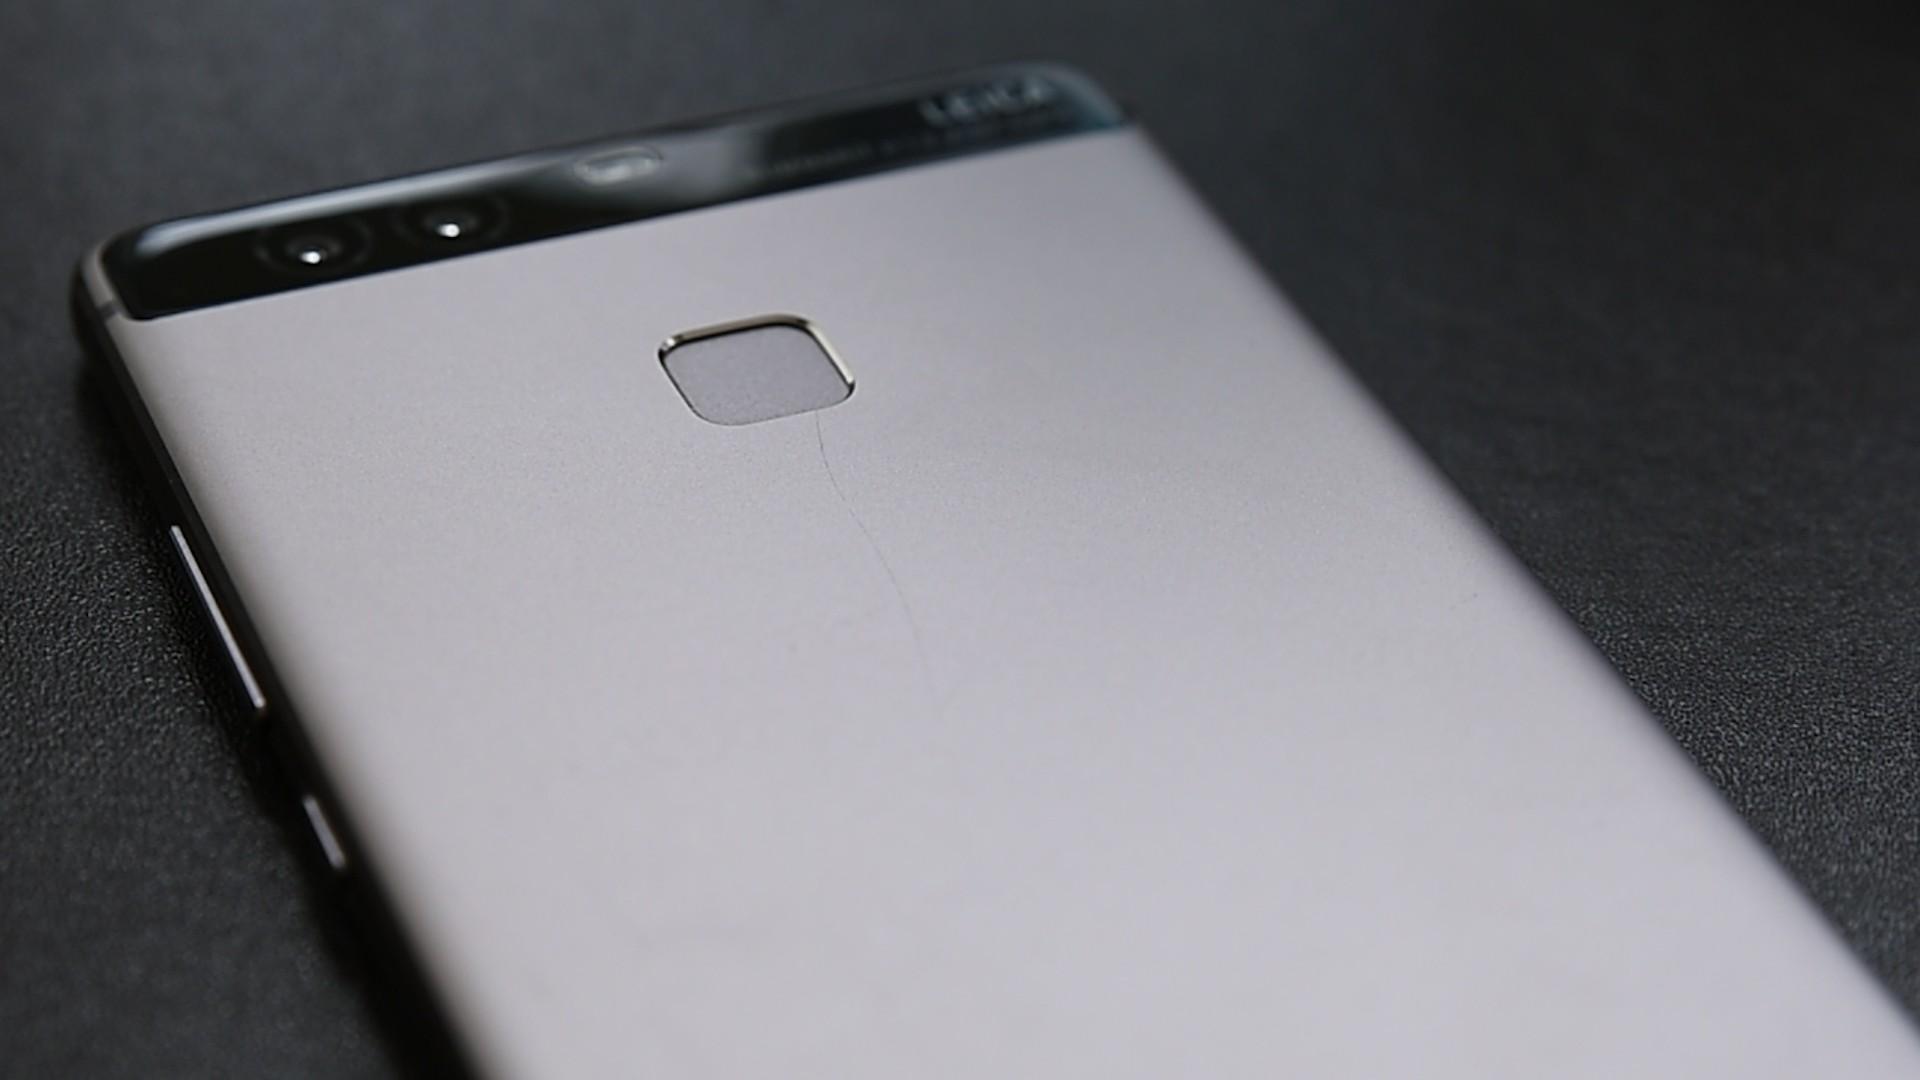 Huawei-p9-recenzja-05